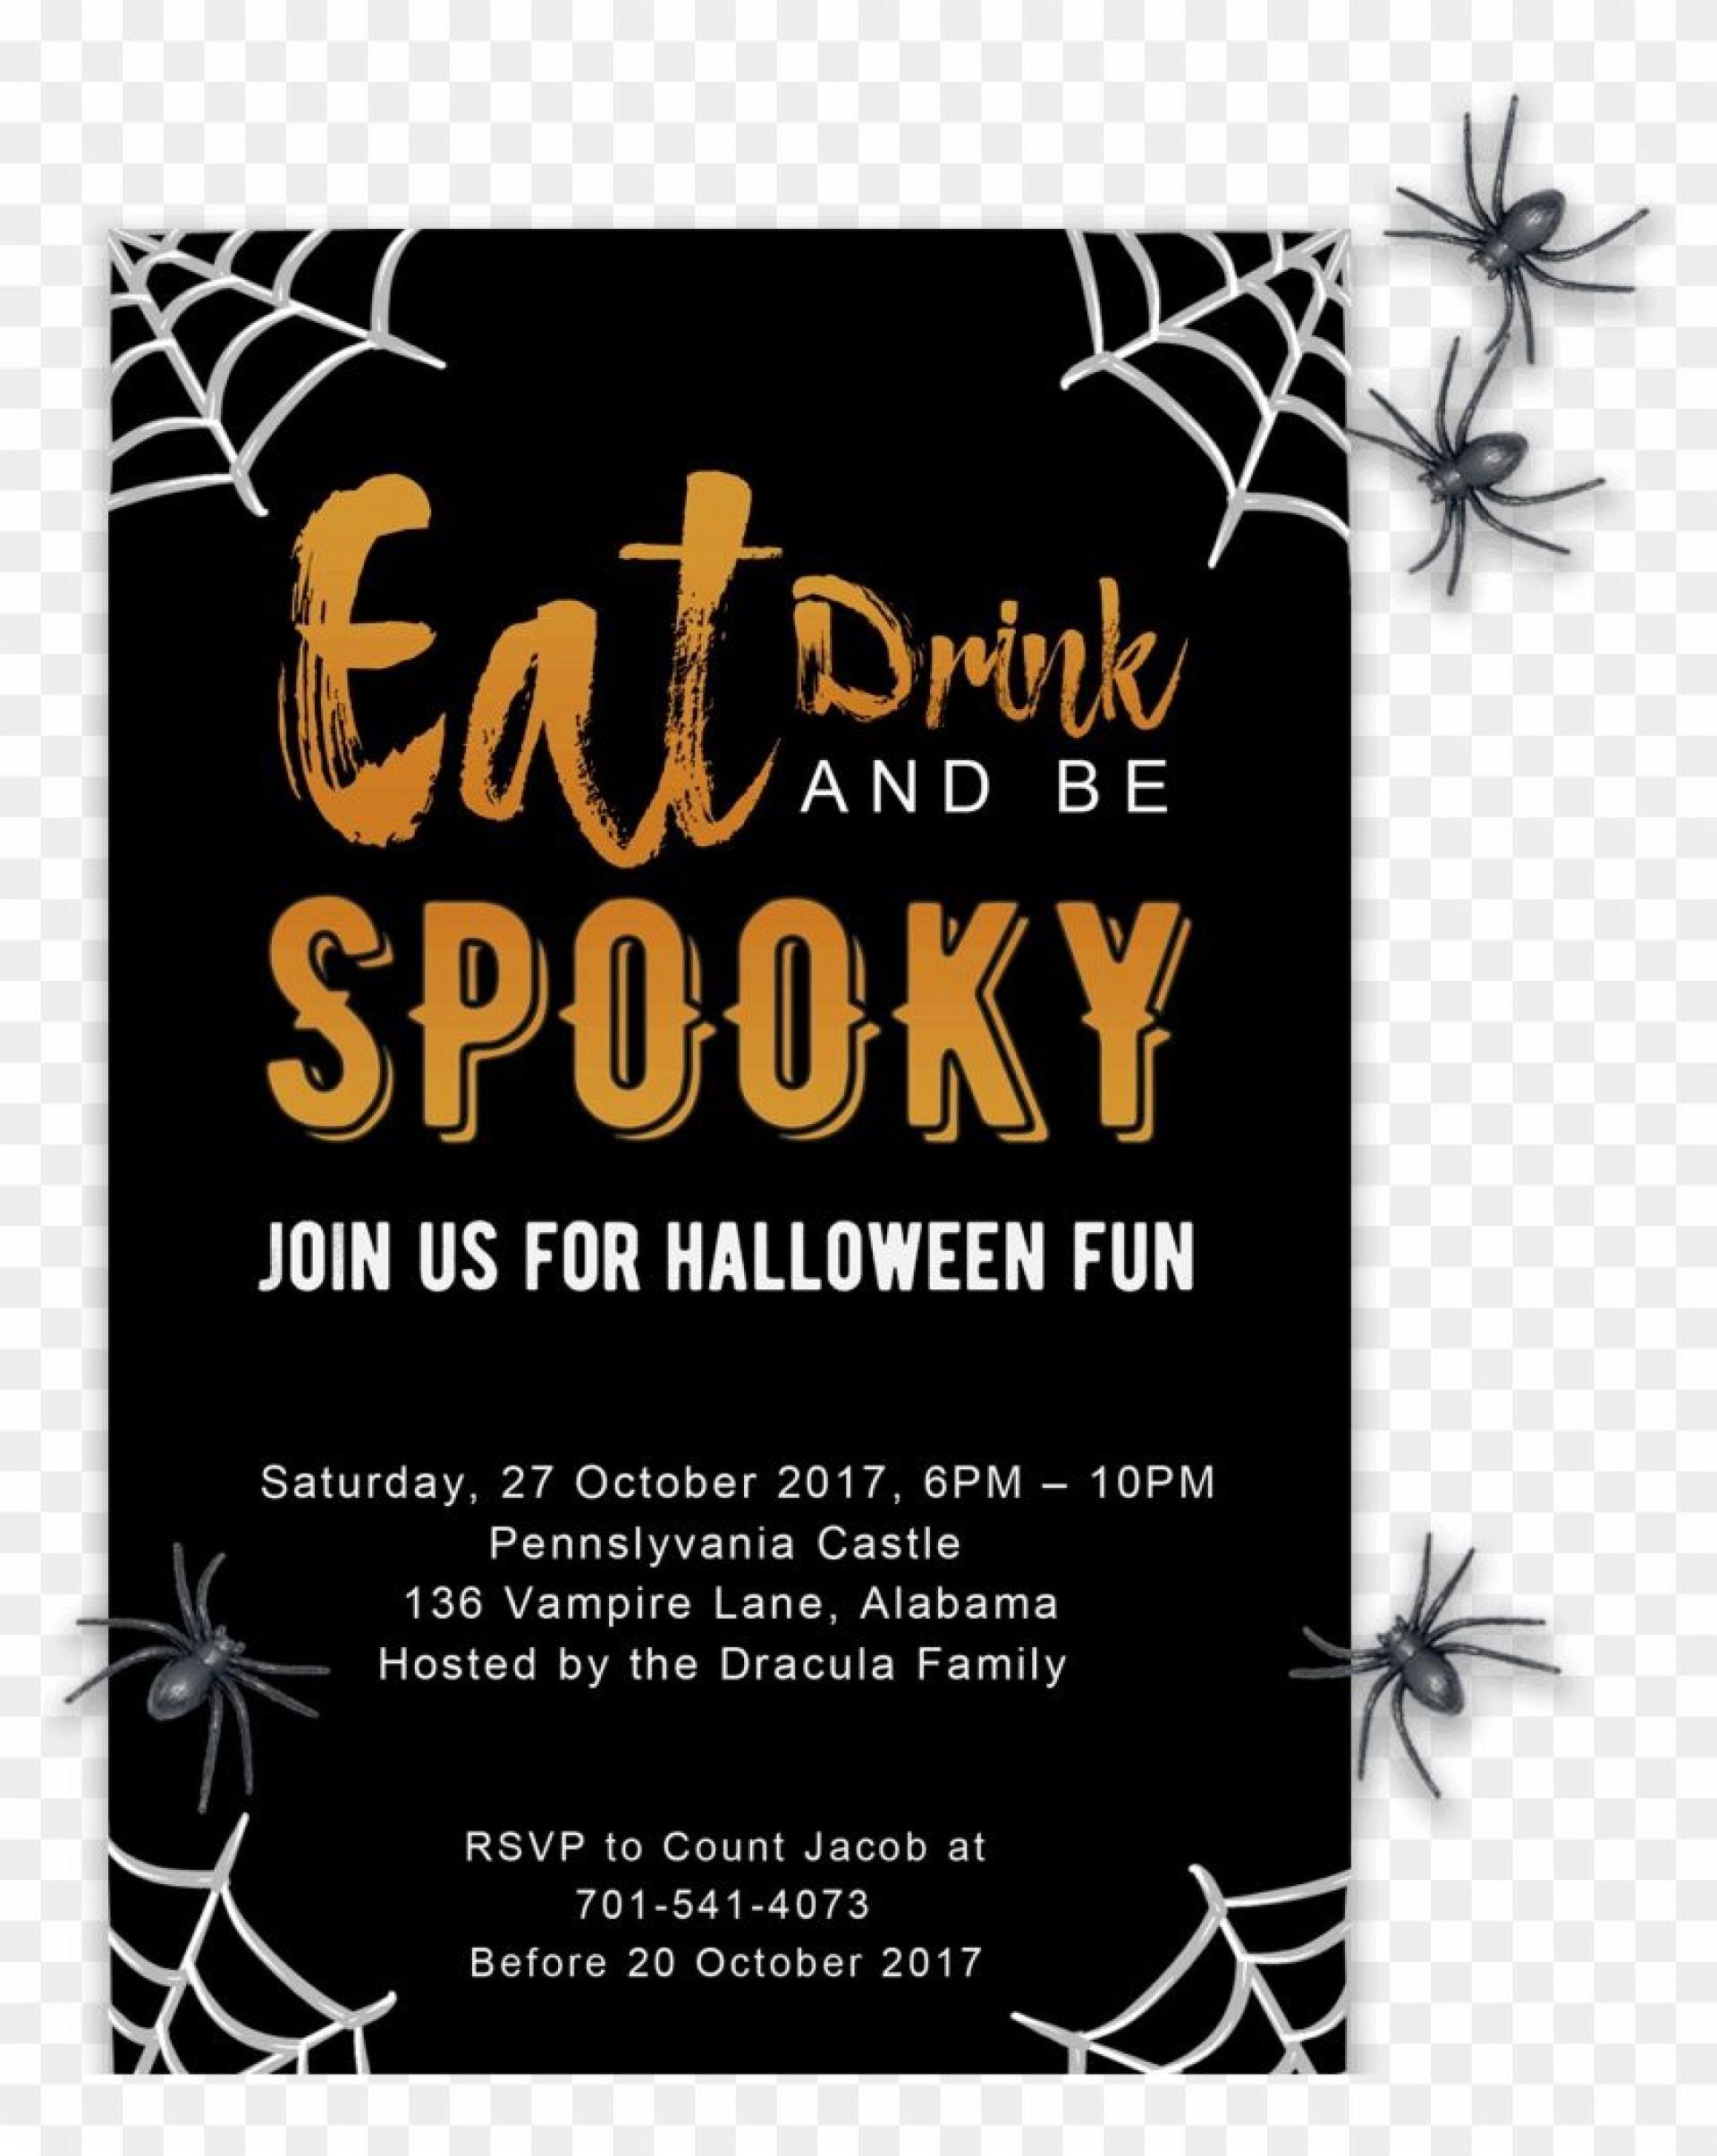 005 Phenomenal Halloween Invitation Template Microsoft Word Highest Clarity  Birthday Free1920